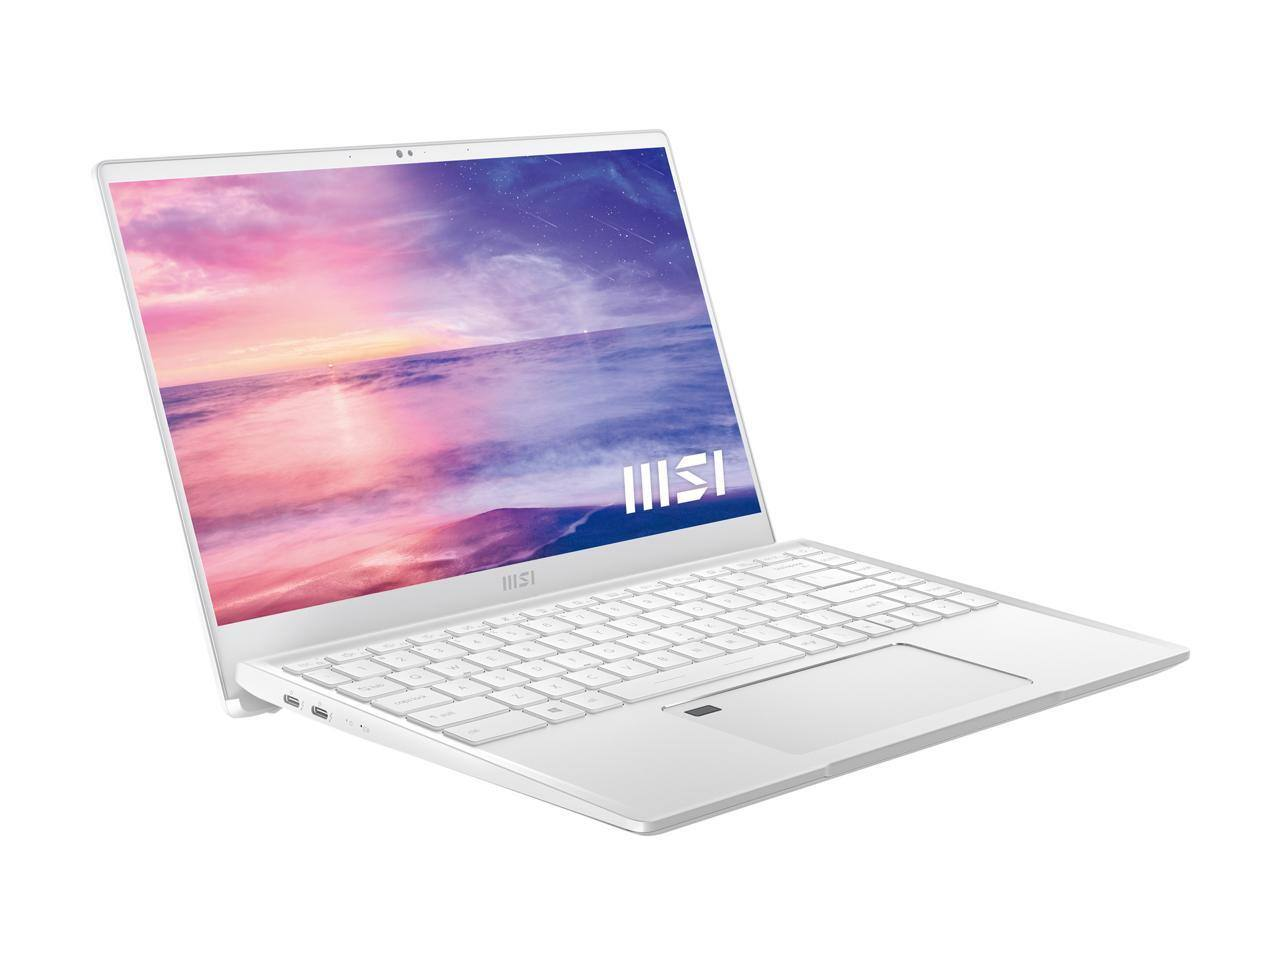 MSI Laptop Prestige 14 EVO Intel Core i5 11th Gen 1135G7 (2.40 GHz) 16 GB  512 GB $630 shipped A/C